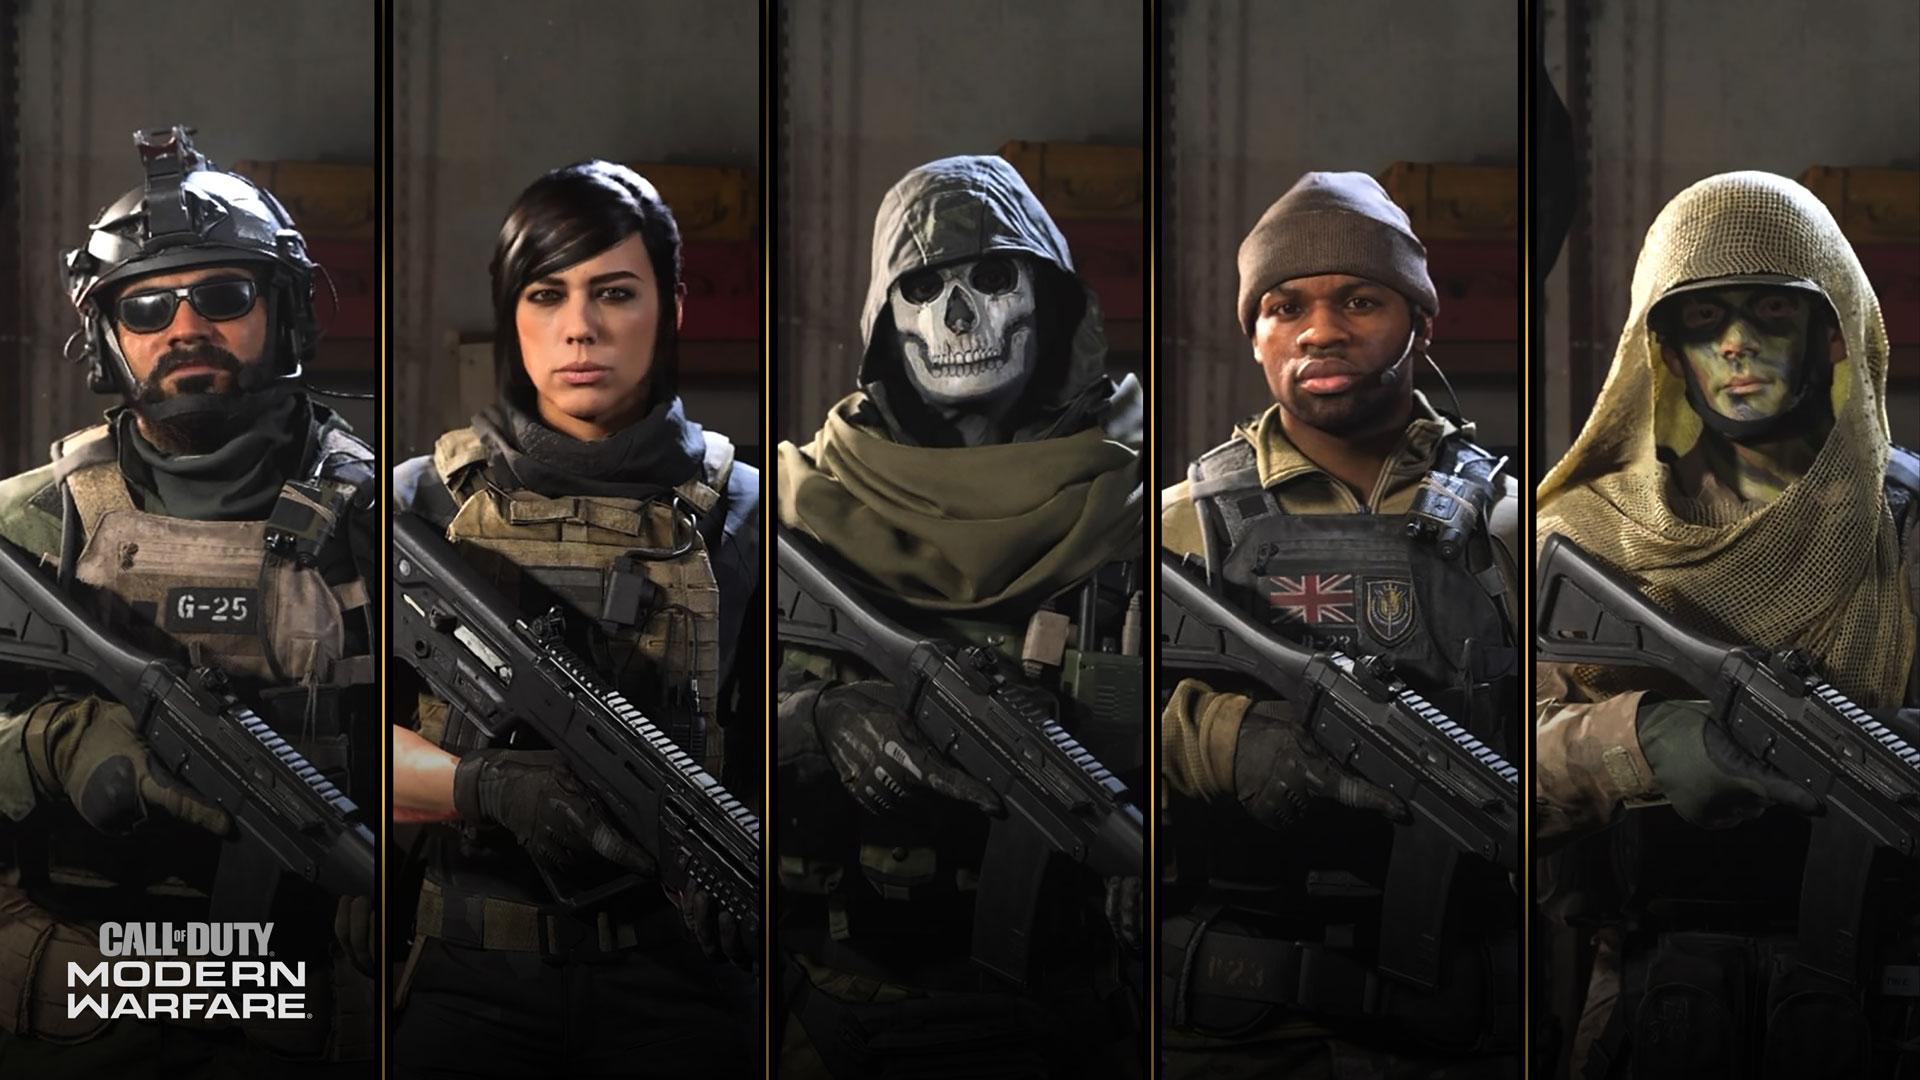 call of duty modern warfare characters